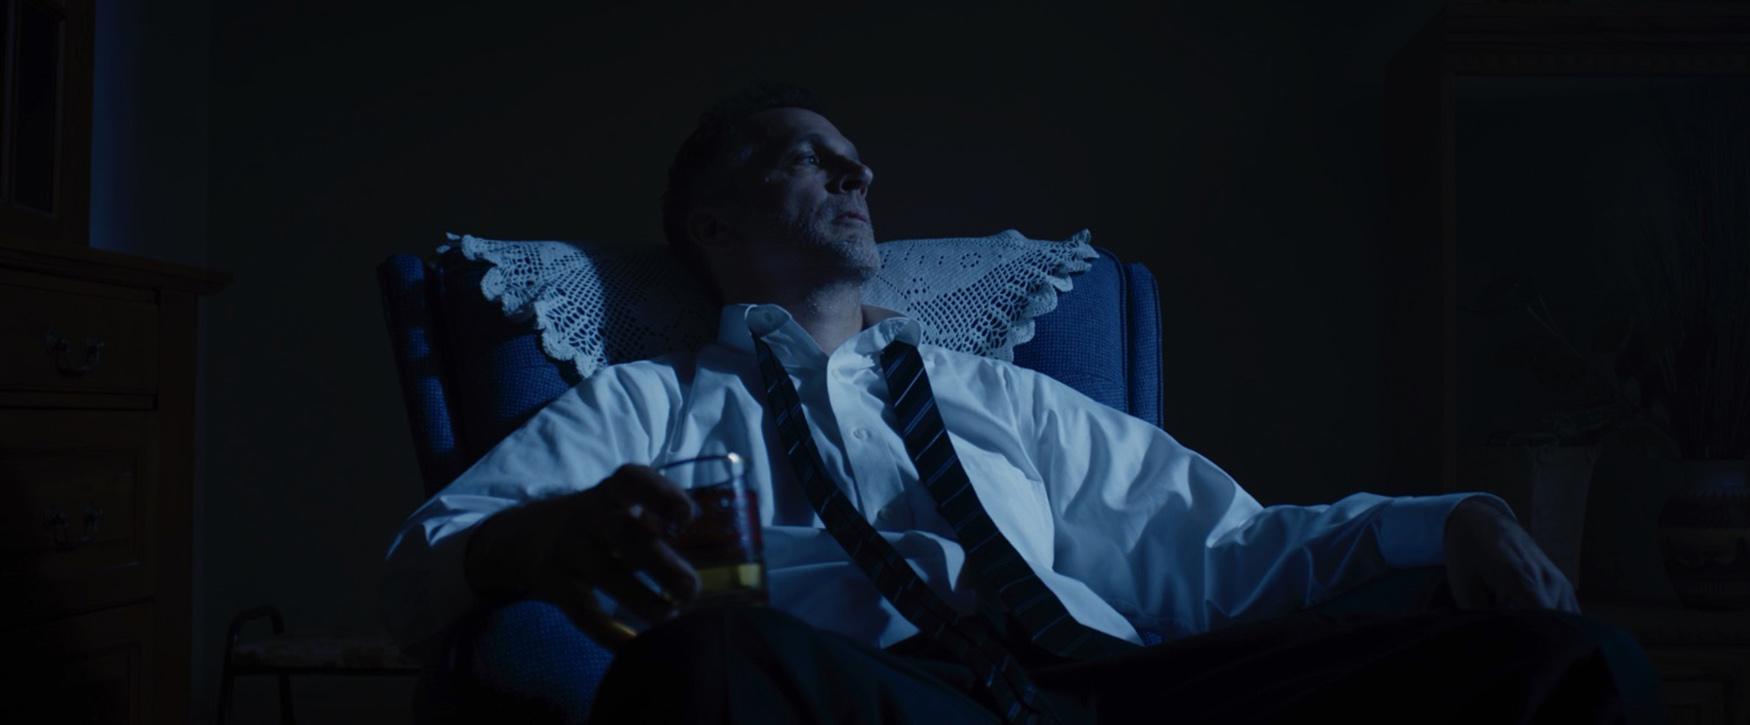 They Who Surround Us - Roman in Chair - Un thème parfait